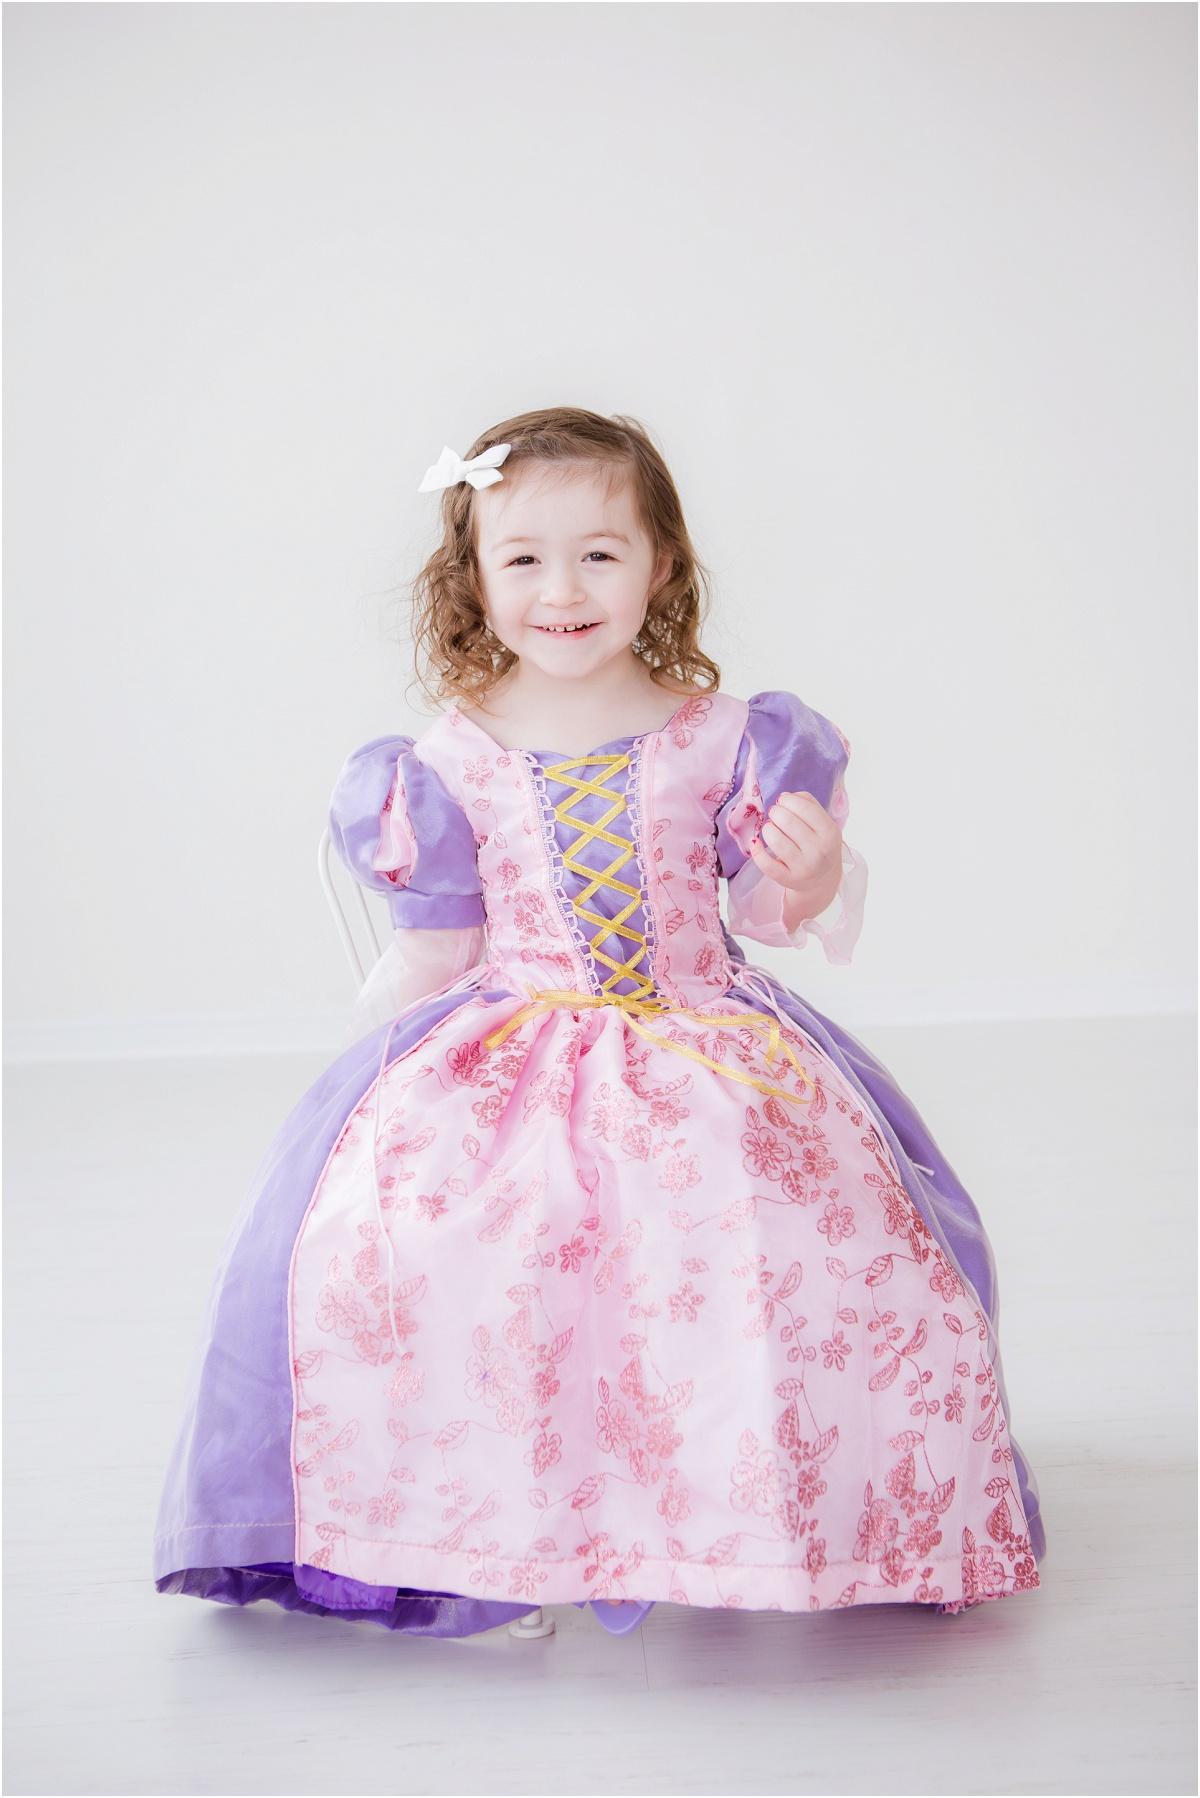 Disney Princess Dress Up Terra Cooper Photography_5635.jpg